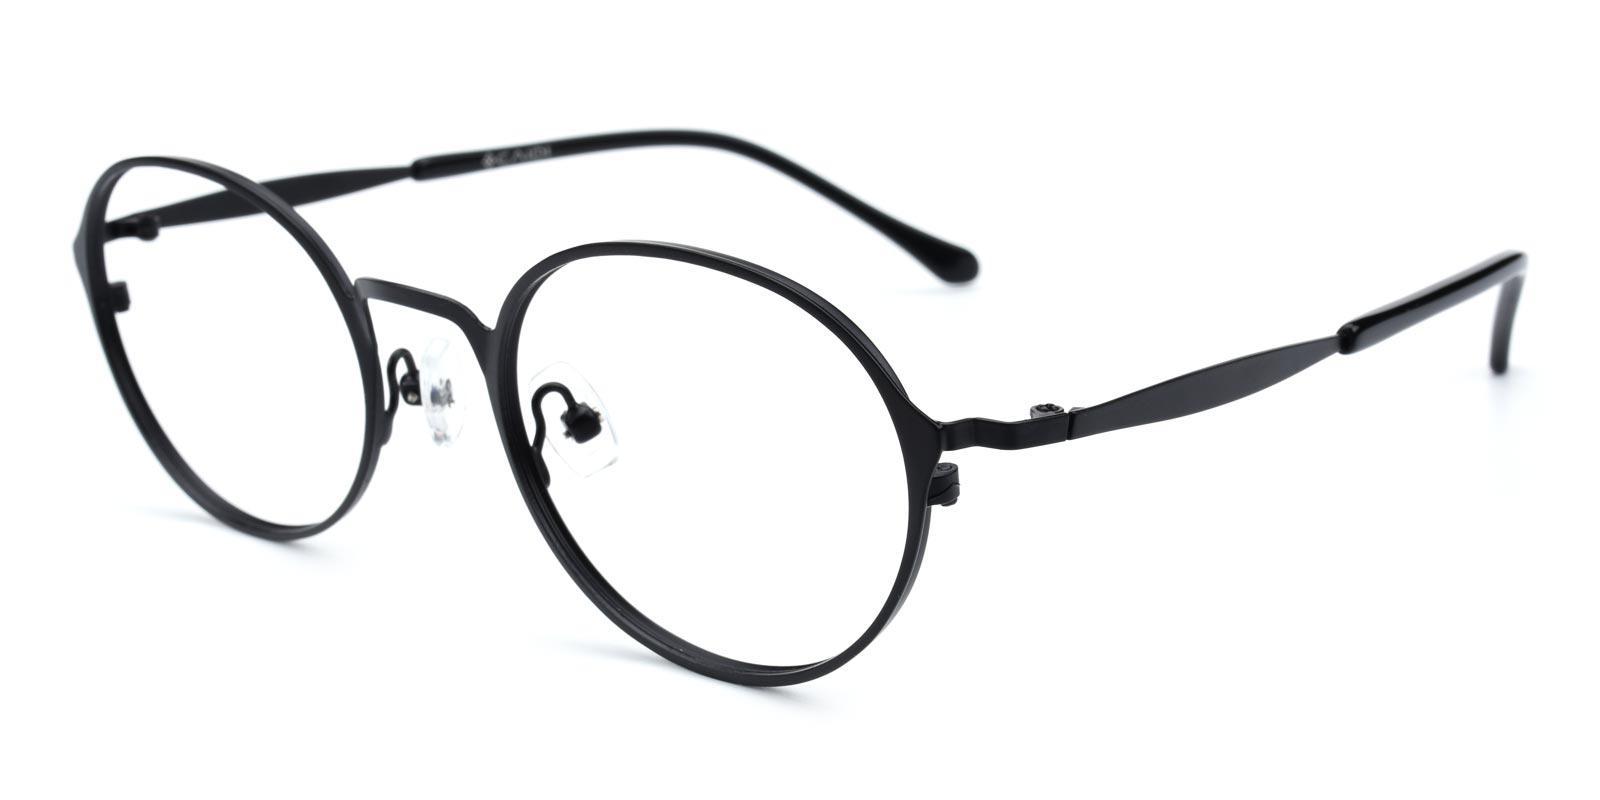 Gulio-Black-Oval-Metal-Eyeglasses-additional1